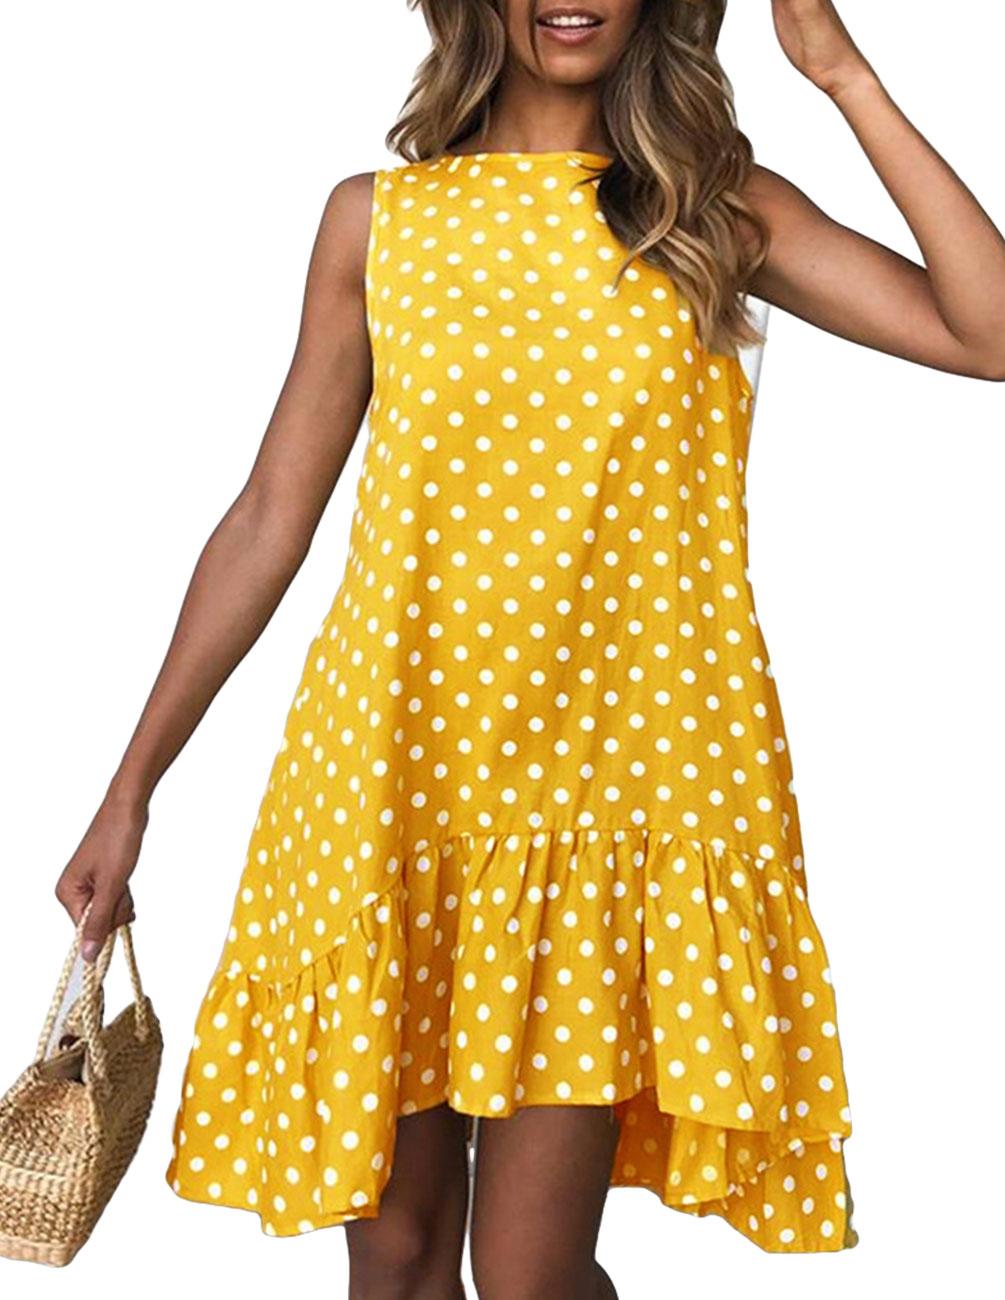 Summer Women Ruffled V collar Sleeveless Sling Dress Popular Polka Dot Prints Irregular Ruffled Holiday Vestidos in Dresses from Women 39 s Clothing